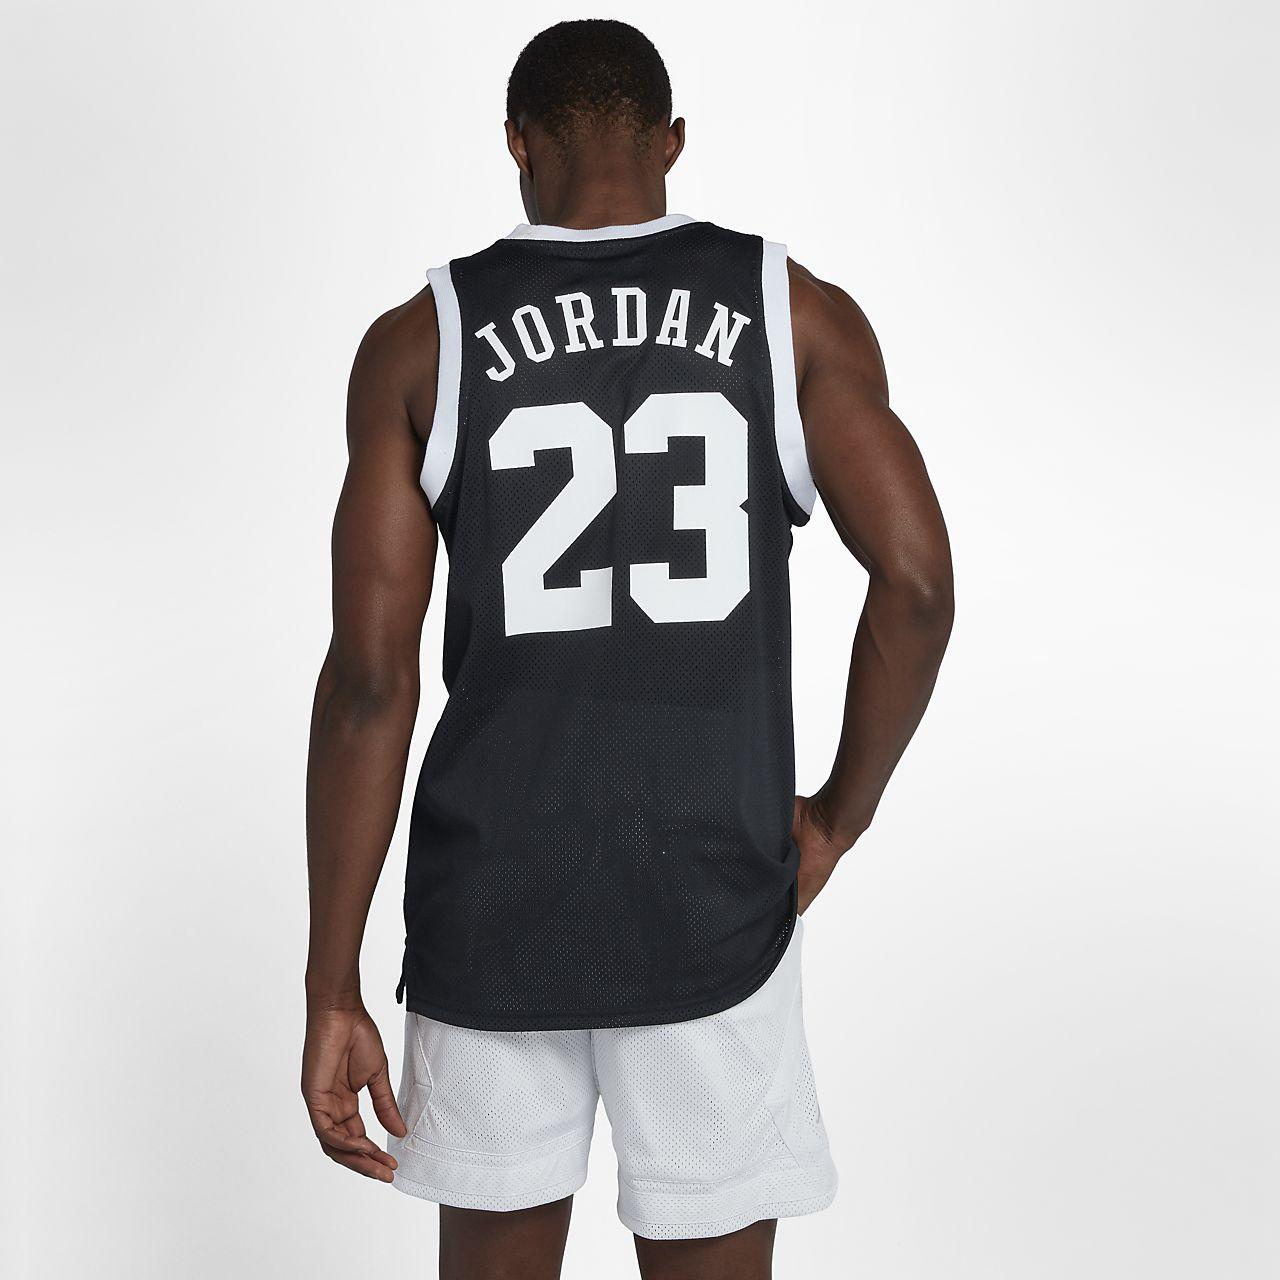 2a512a76b90 Jordan Jumpman Air Mesh Men's Basketball Jersey. Nike.com GB